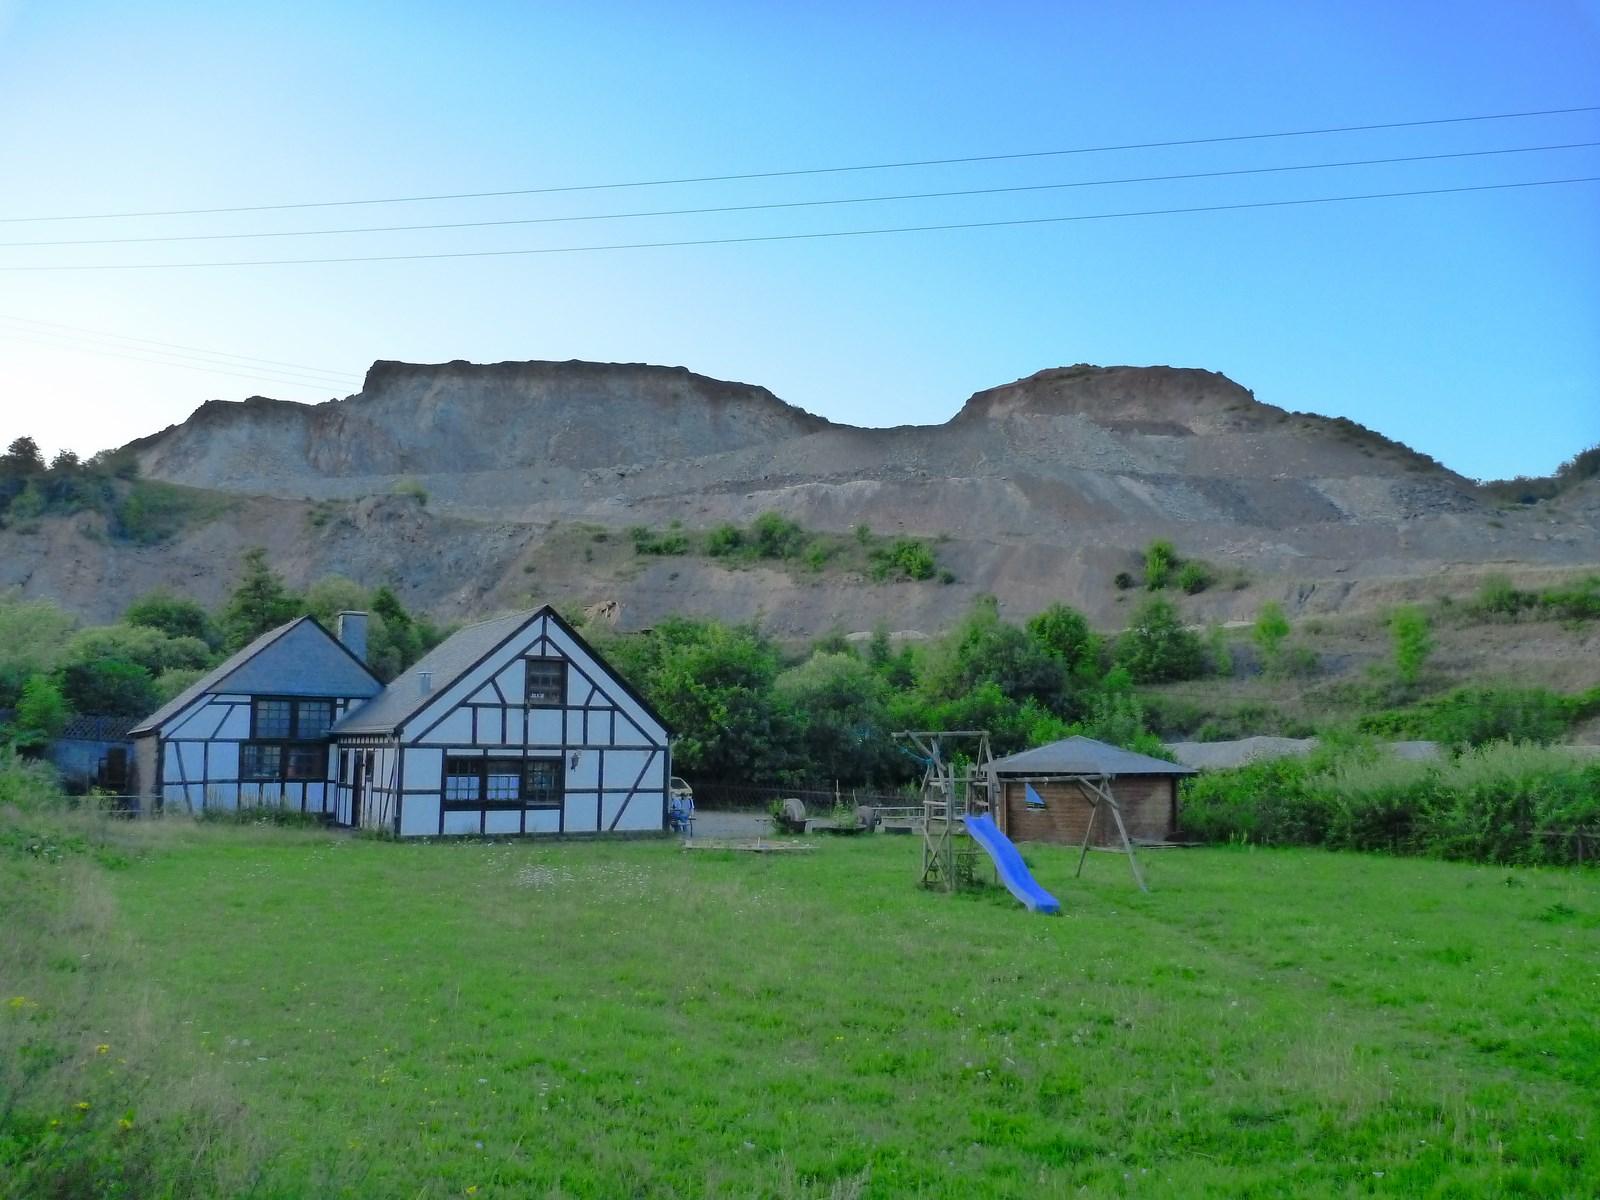 Blik op de bekende Juchem groeve in de omgeving van Idar-Oberstein